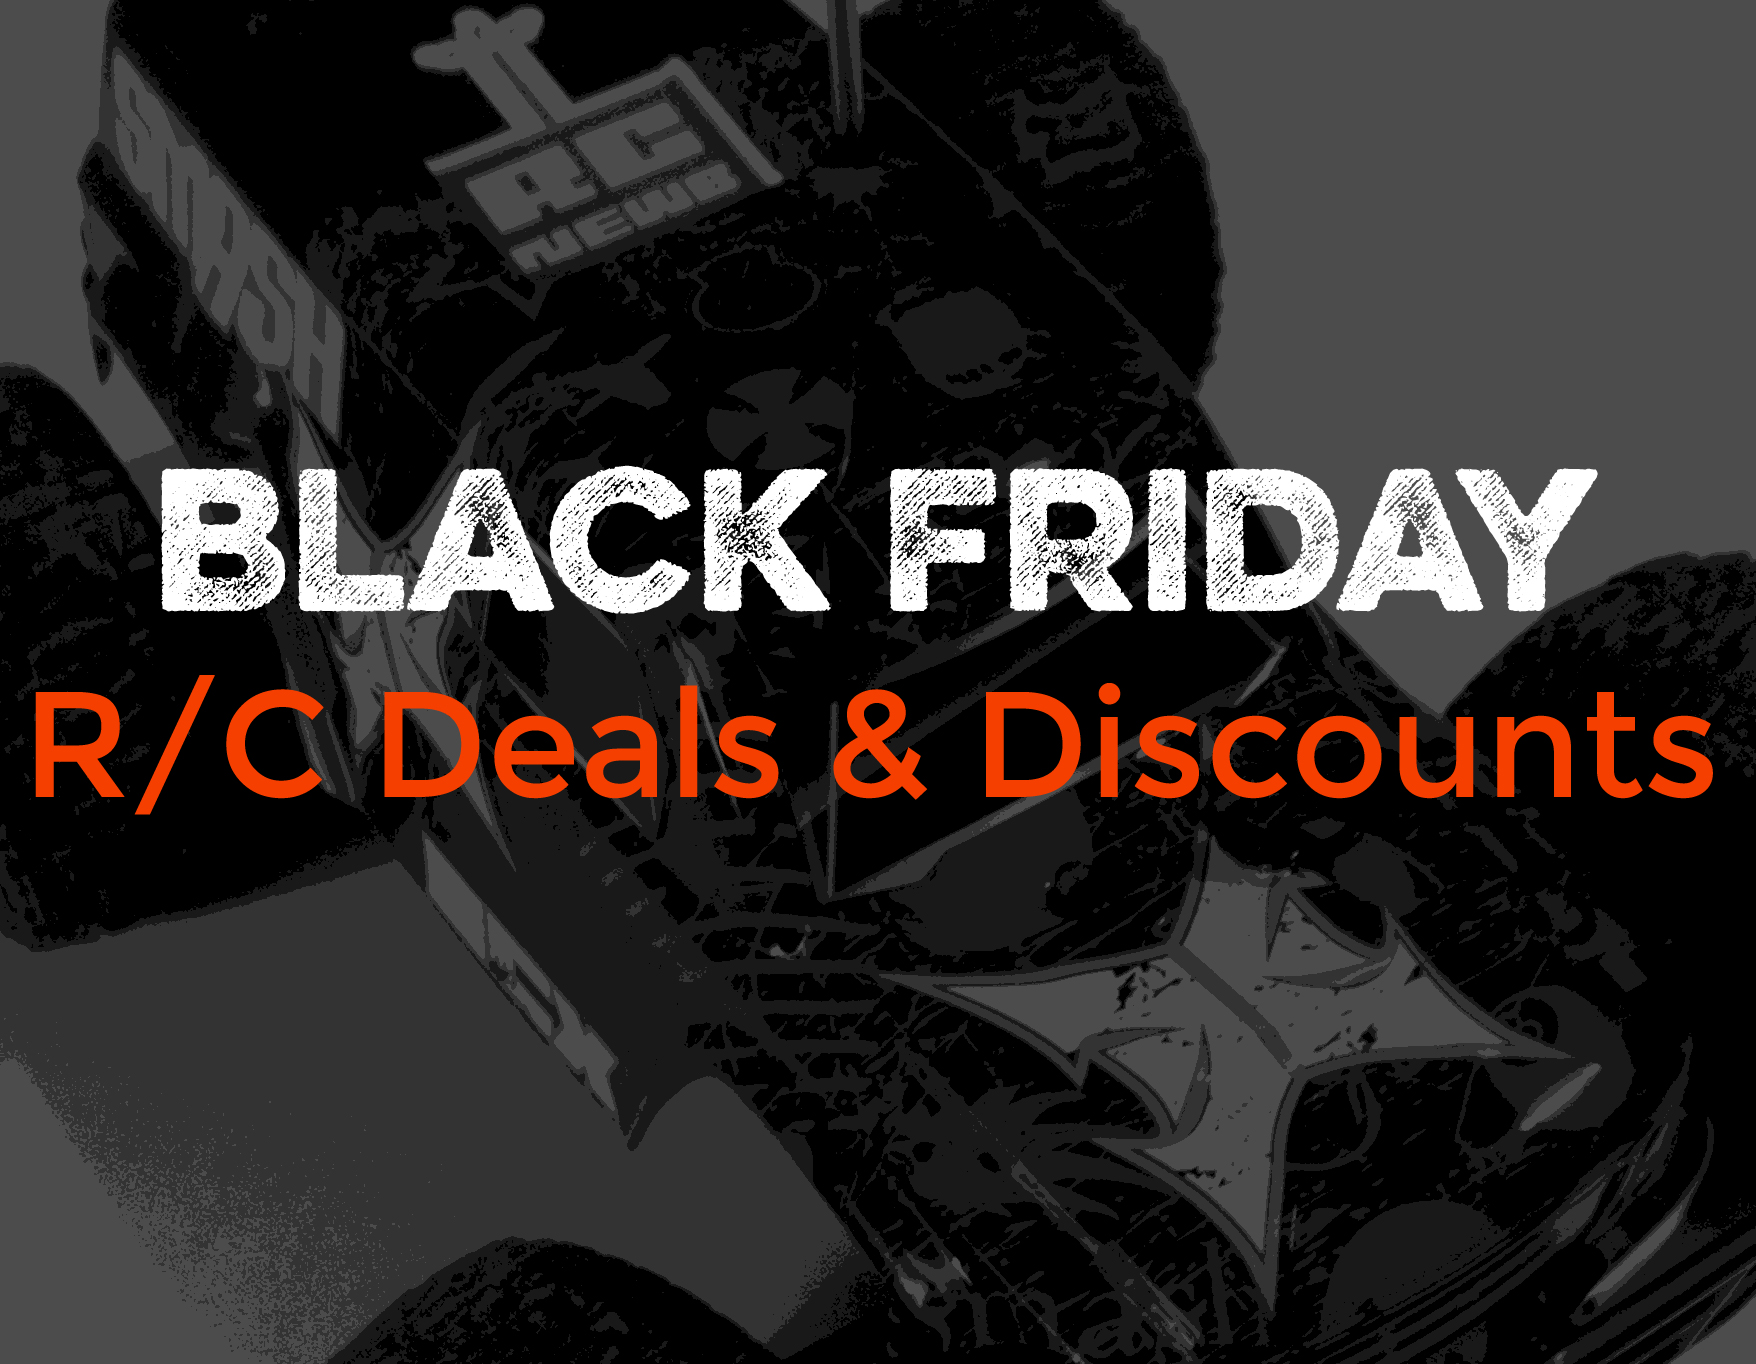 Black Friday Savings for R/C Cars